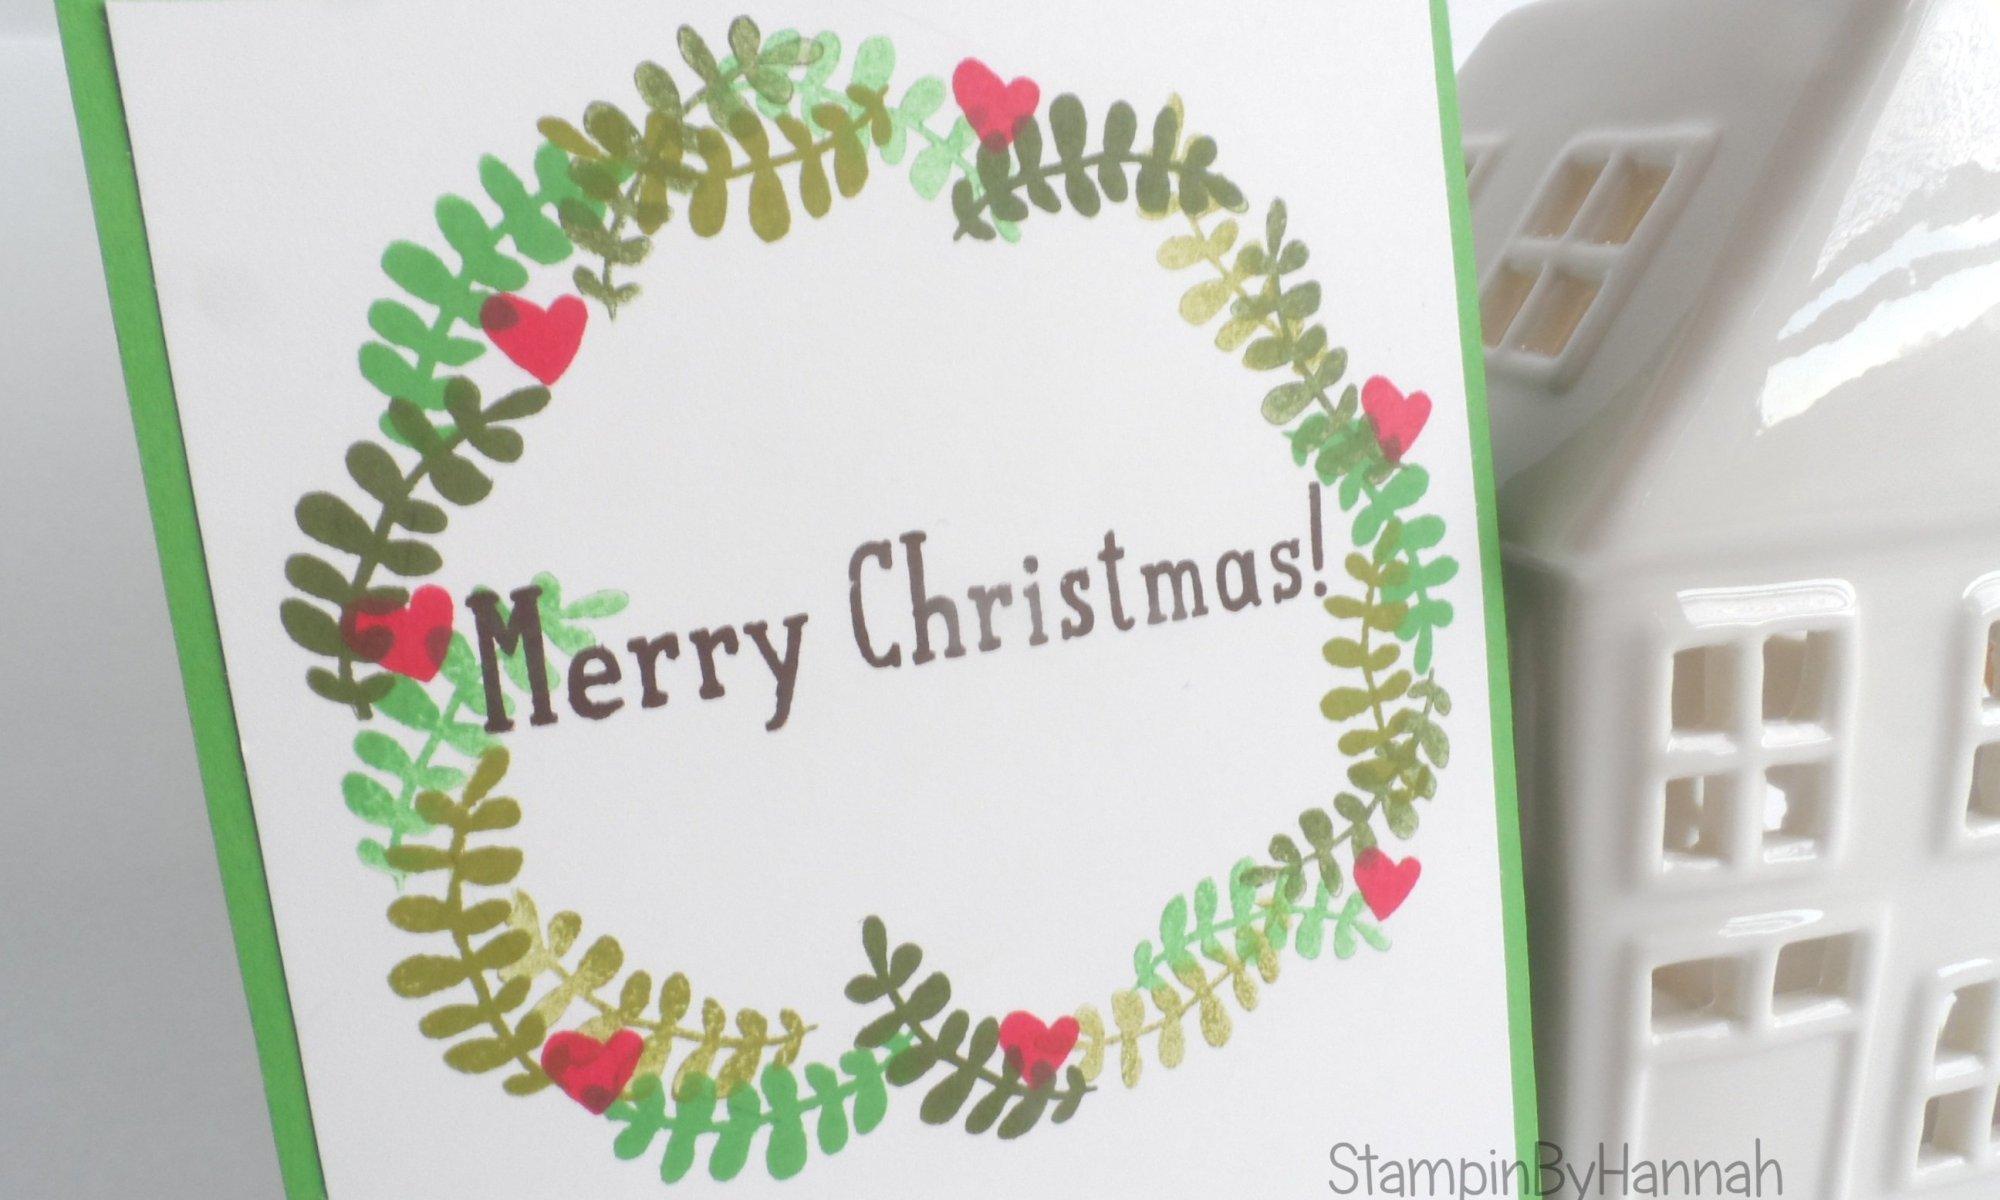 Stampin' Up! UK Christmas wreath